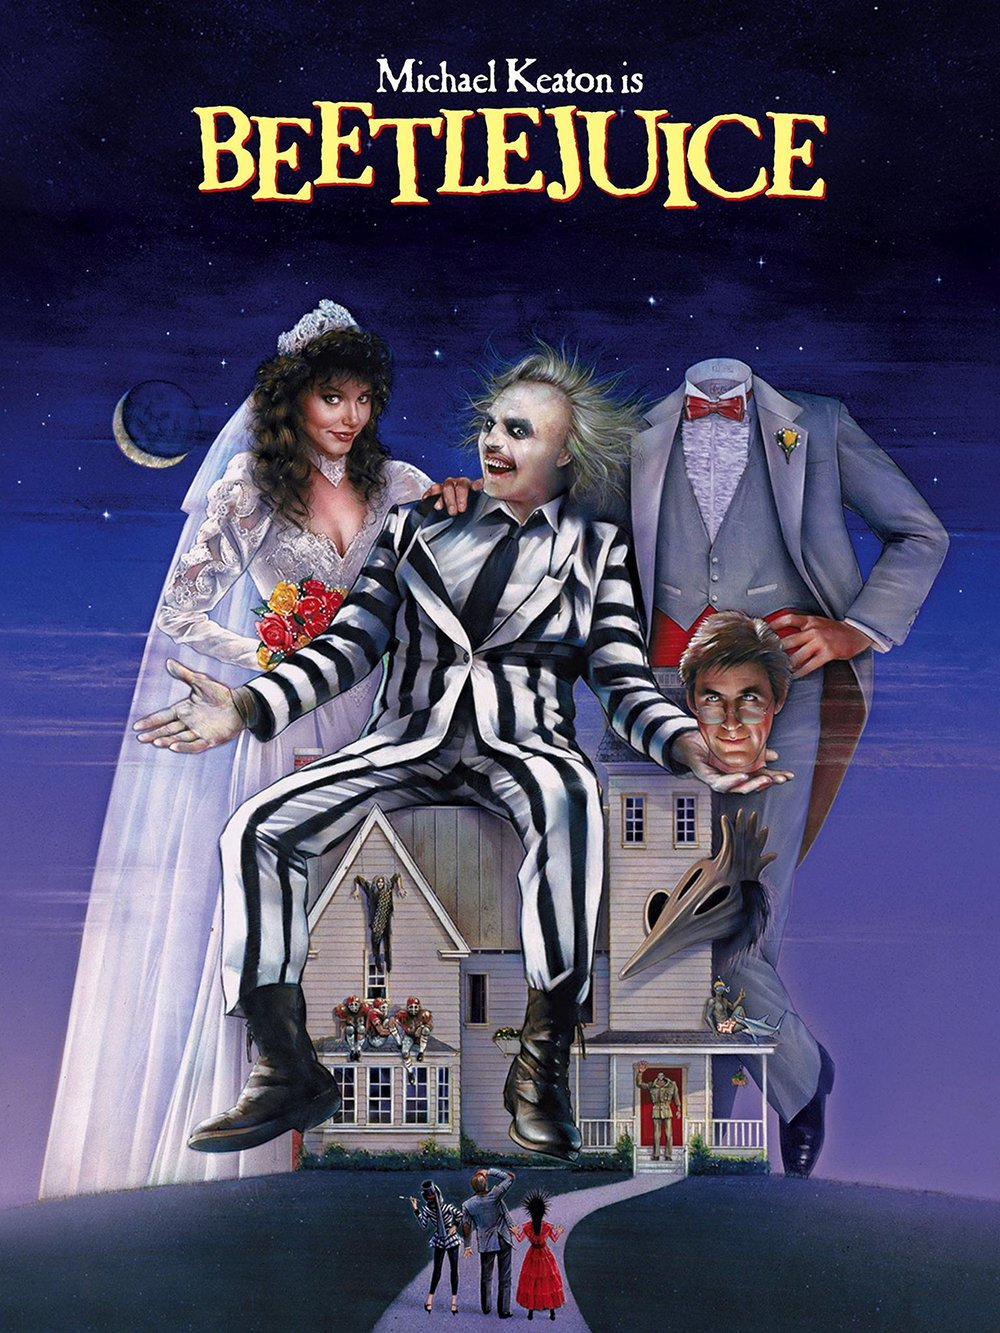 Movie Night - Saturday, October 28